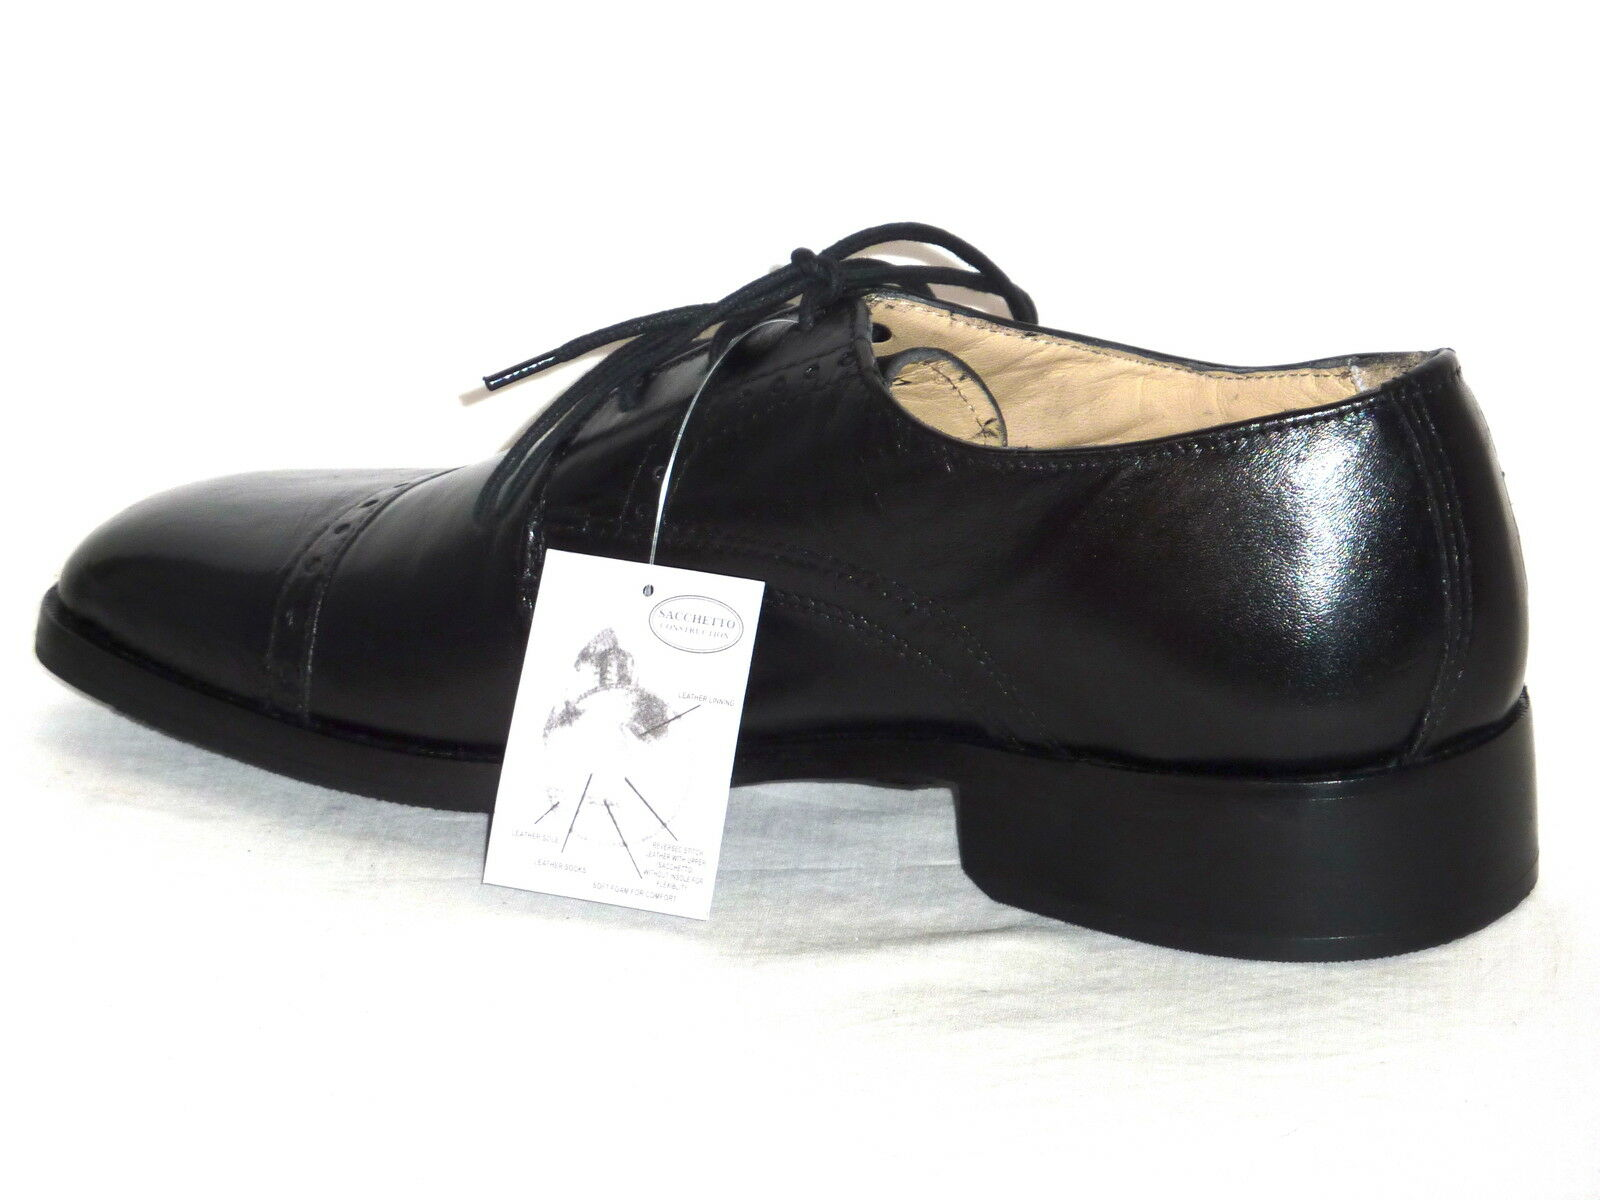 Herrenschuhe anschnallen schwarzes Leder elegant mode komfortabel n. 41